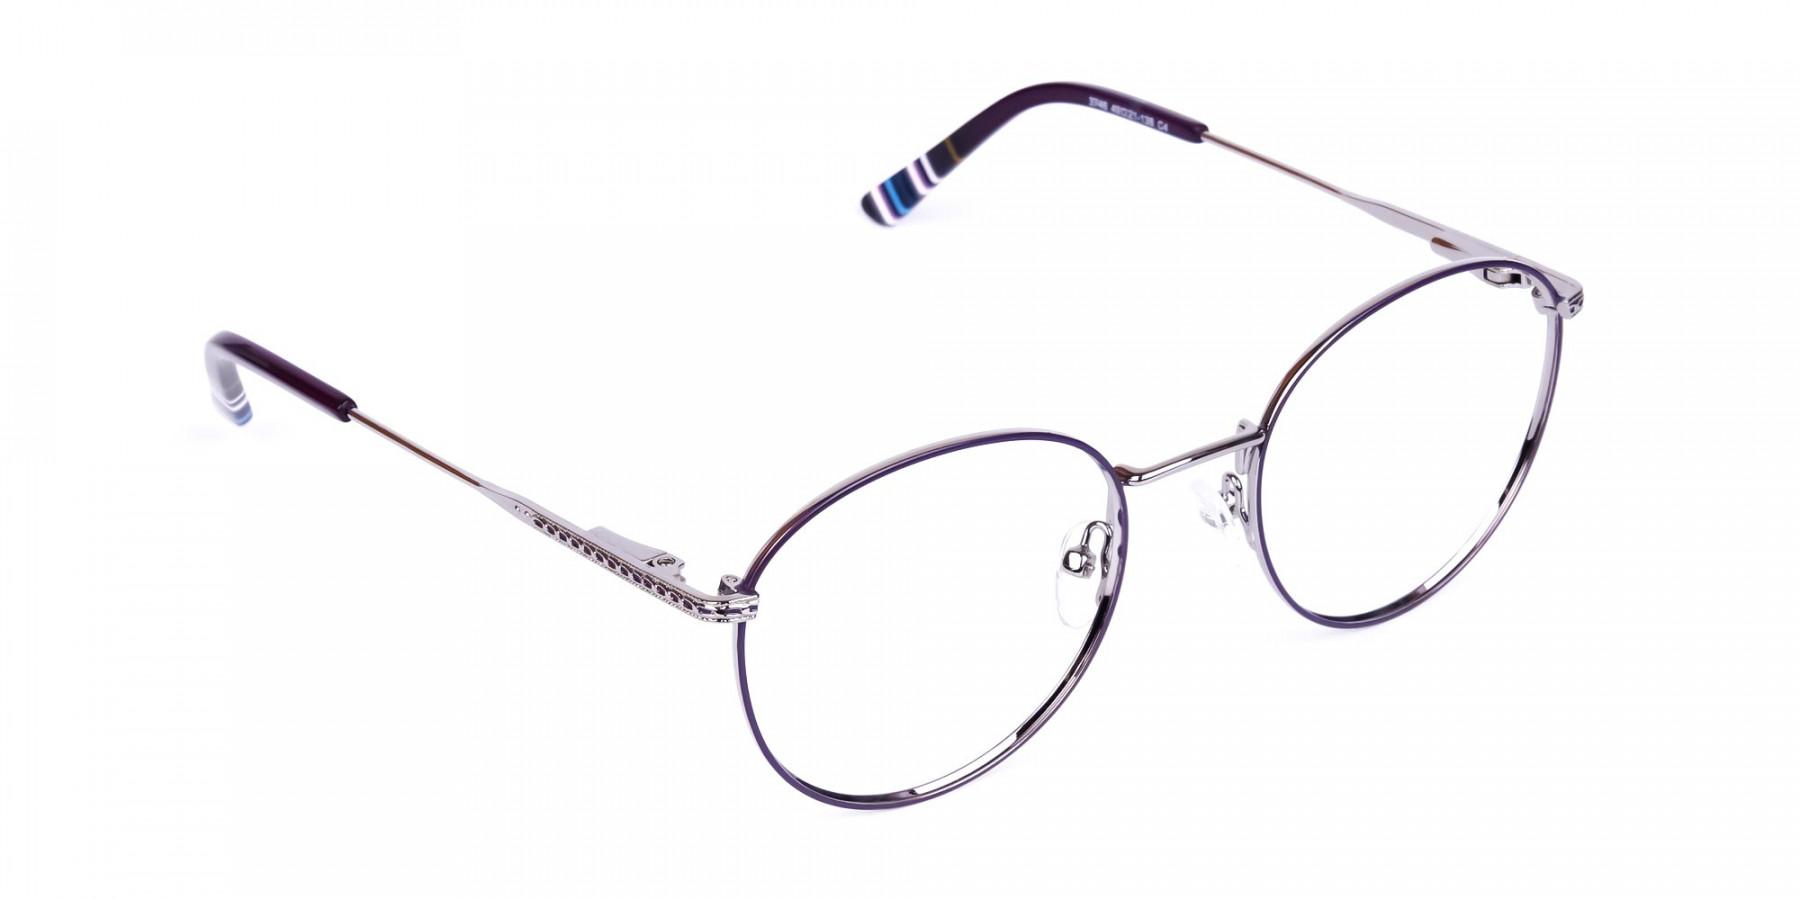 Navy-Blue-Silver-Round-Full-Rim-Glasses-1